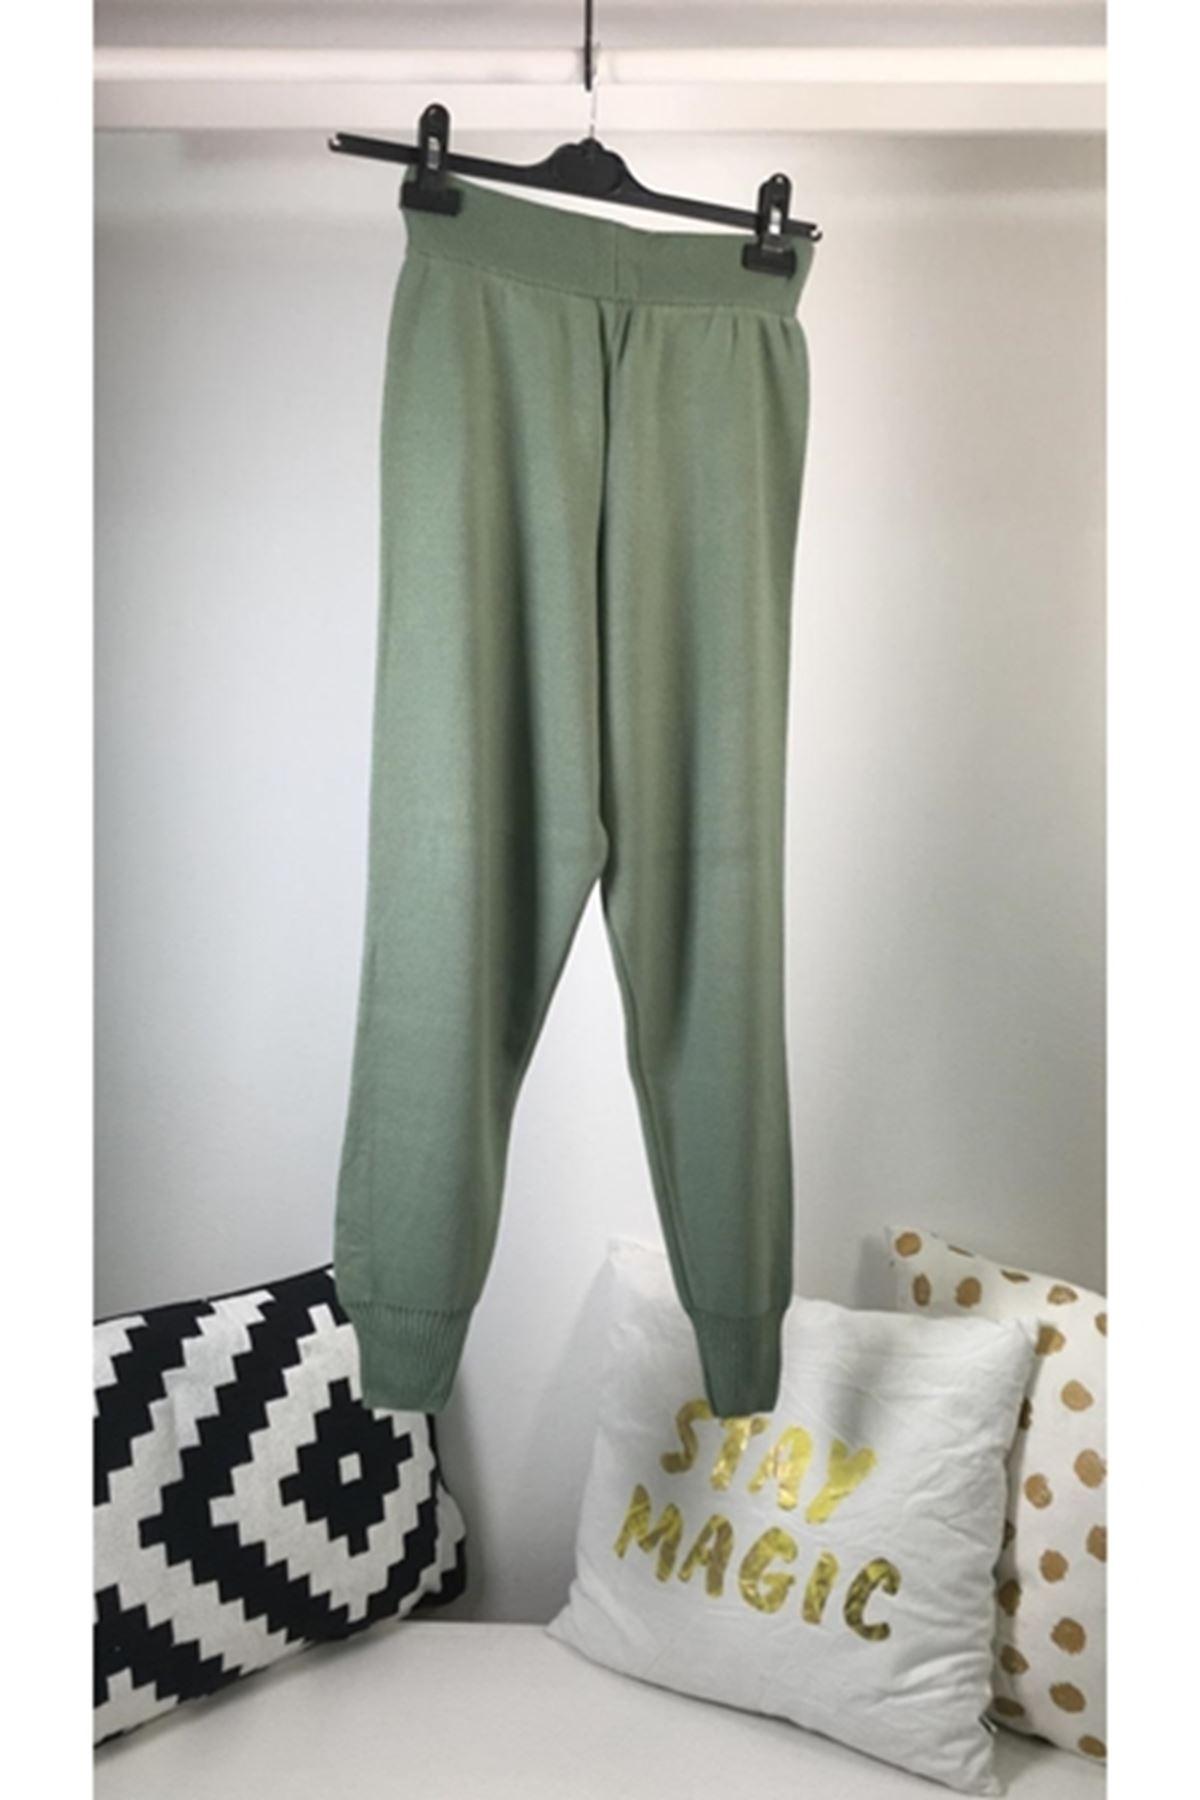 Kuşaklı paça lastik trıko pantolon MİNT YEŞİLİ